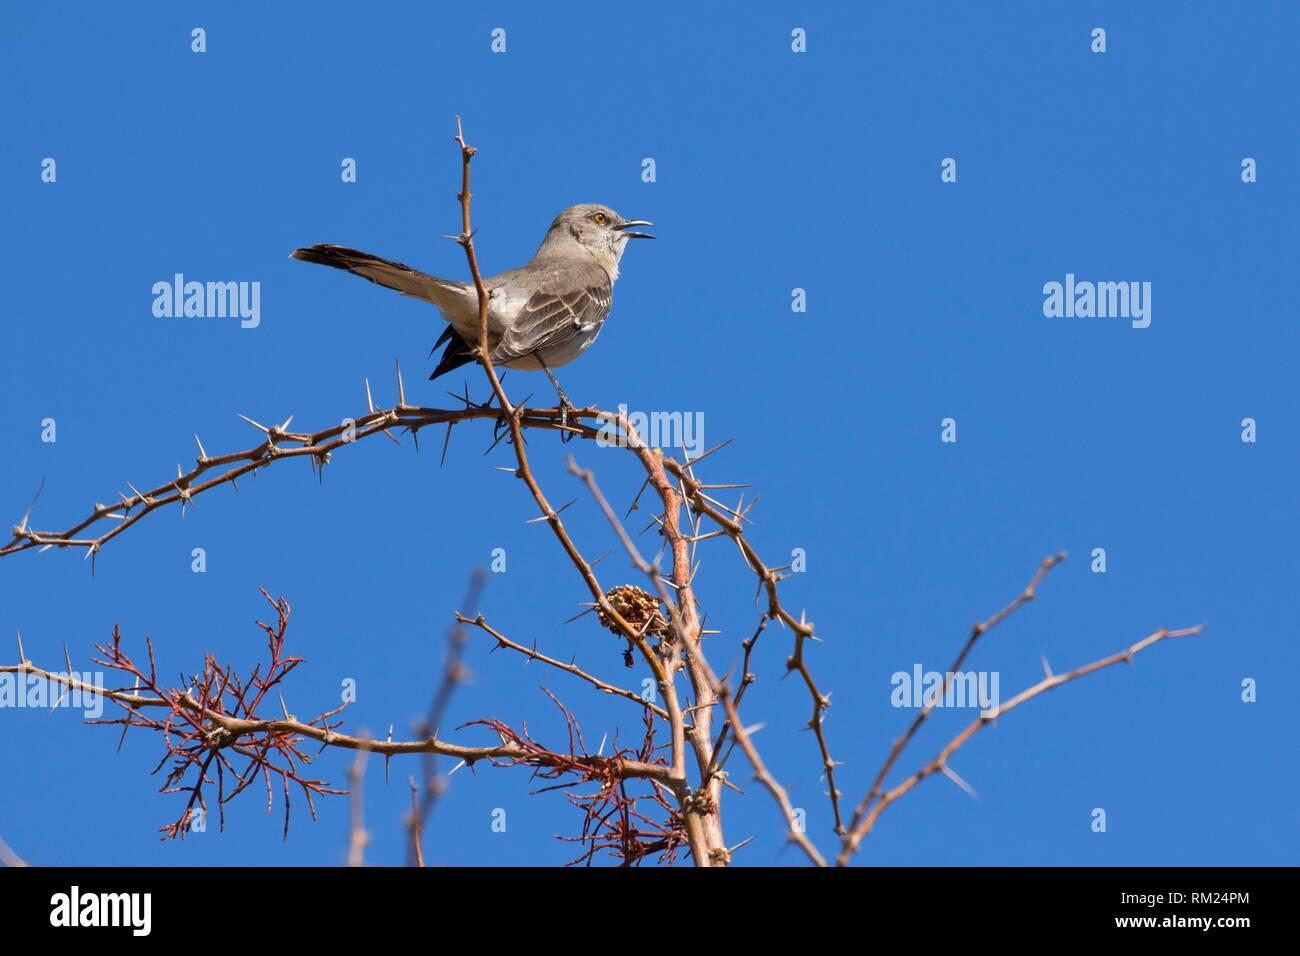 Northern mockingbird, Clark County Wetlands Park, Las Vegas, Nevada. Stock Photo